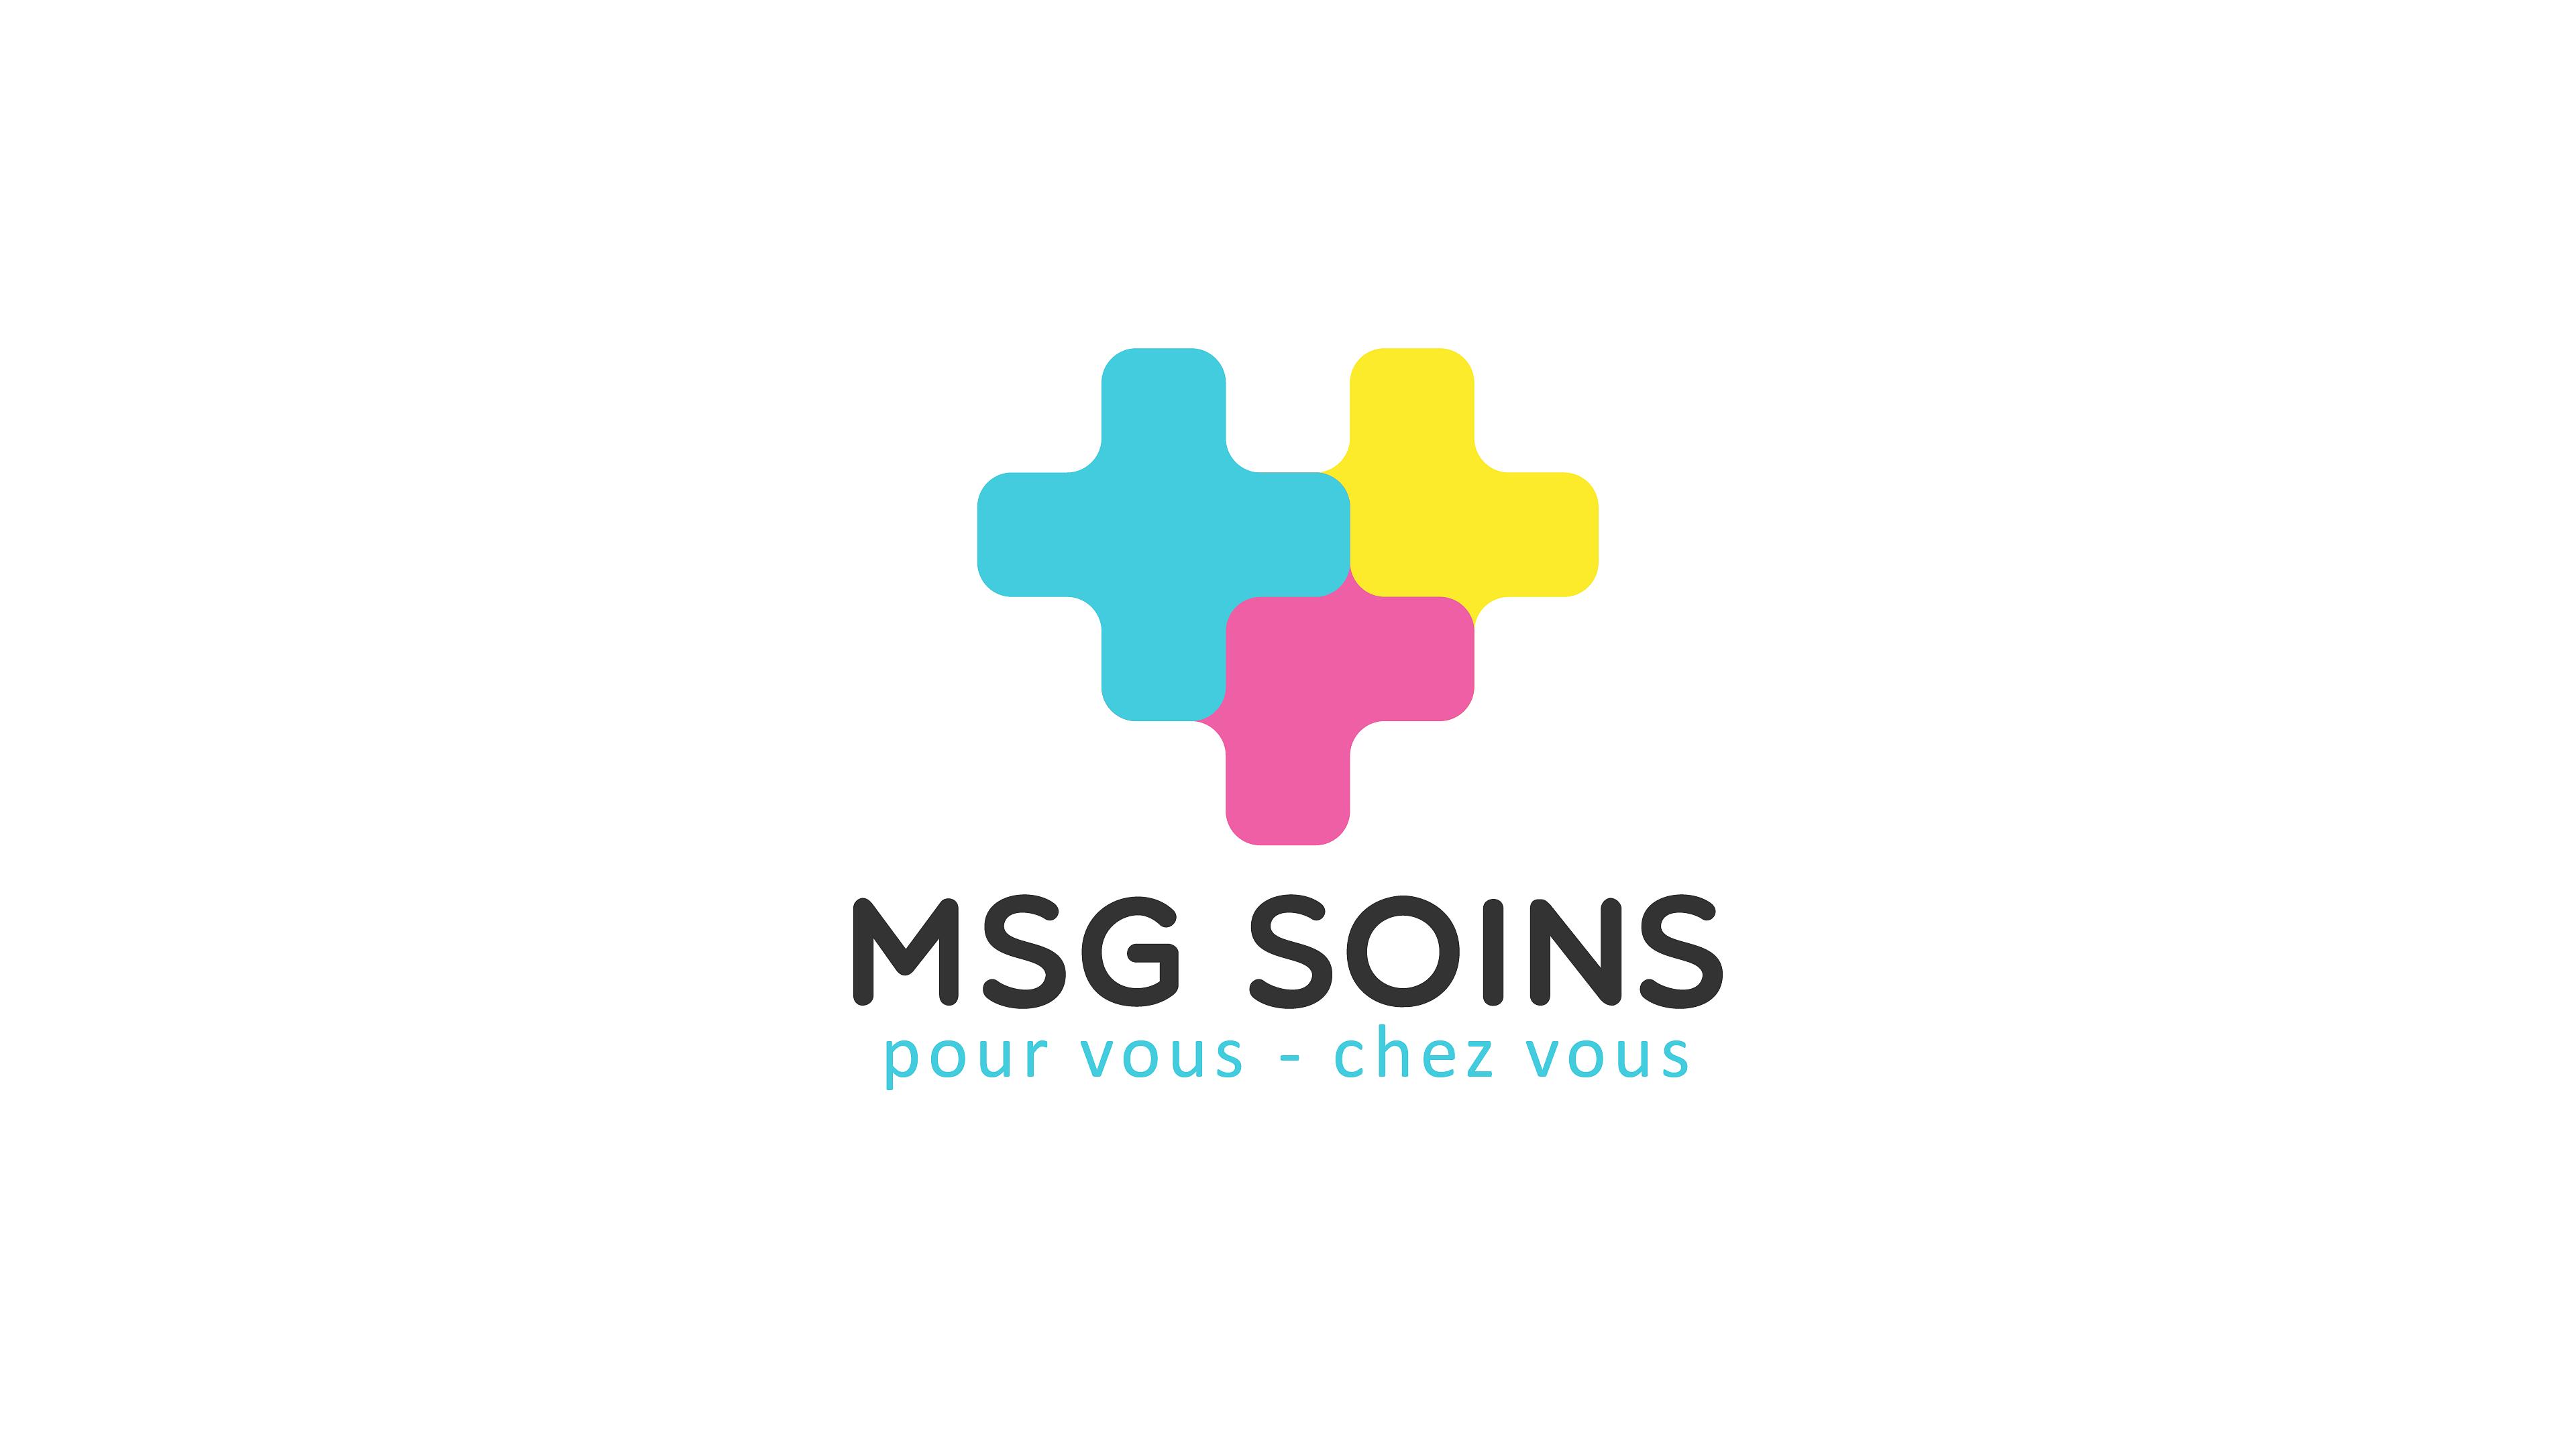 MSG soins Sàrl